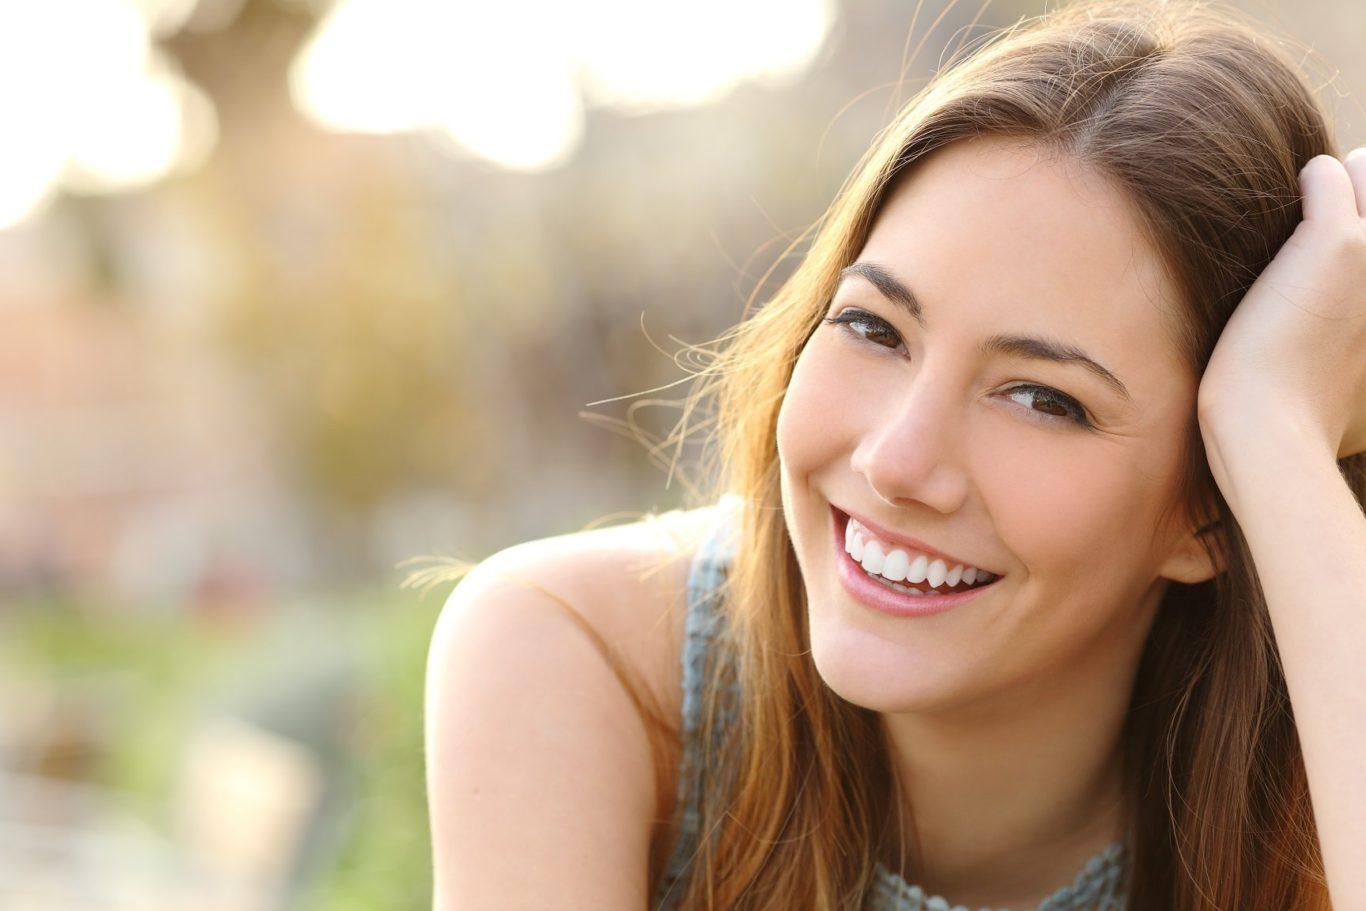 Woman Smiling Bright White Teeth